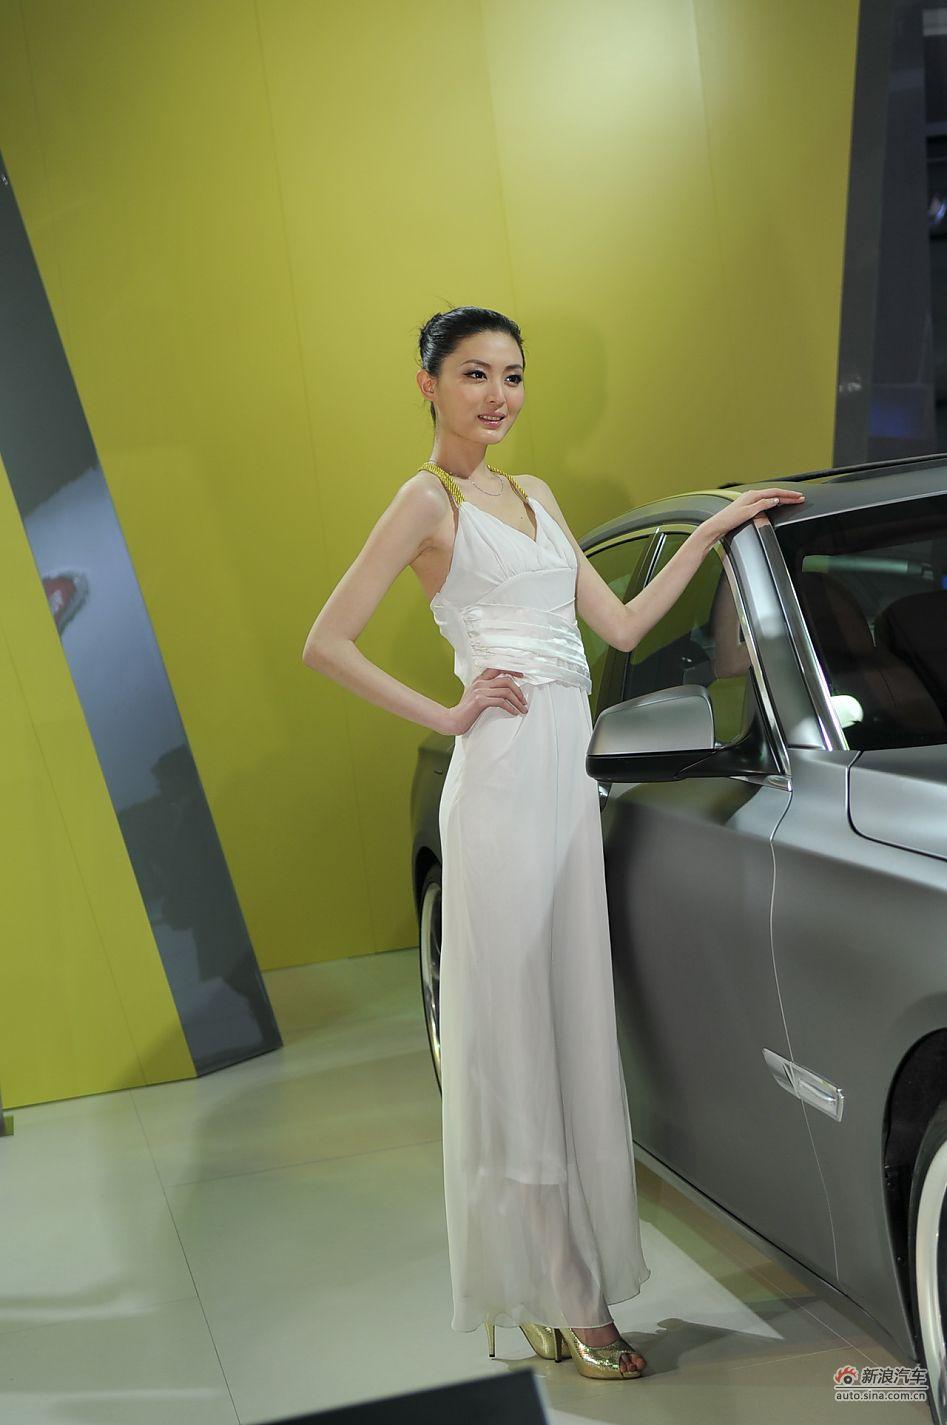 WWW_40AJ_COM_com 2011深圳宝马车展音乐; ac宝马展台2号模特;; www.hnyuhe.